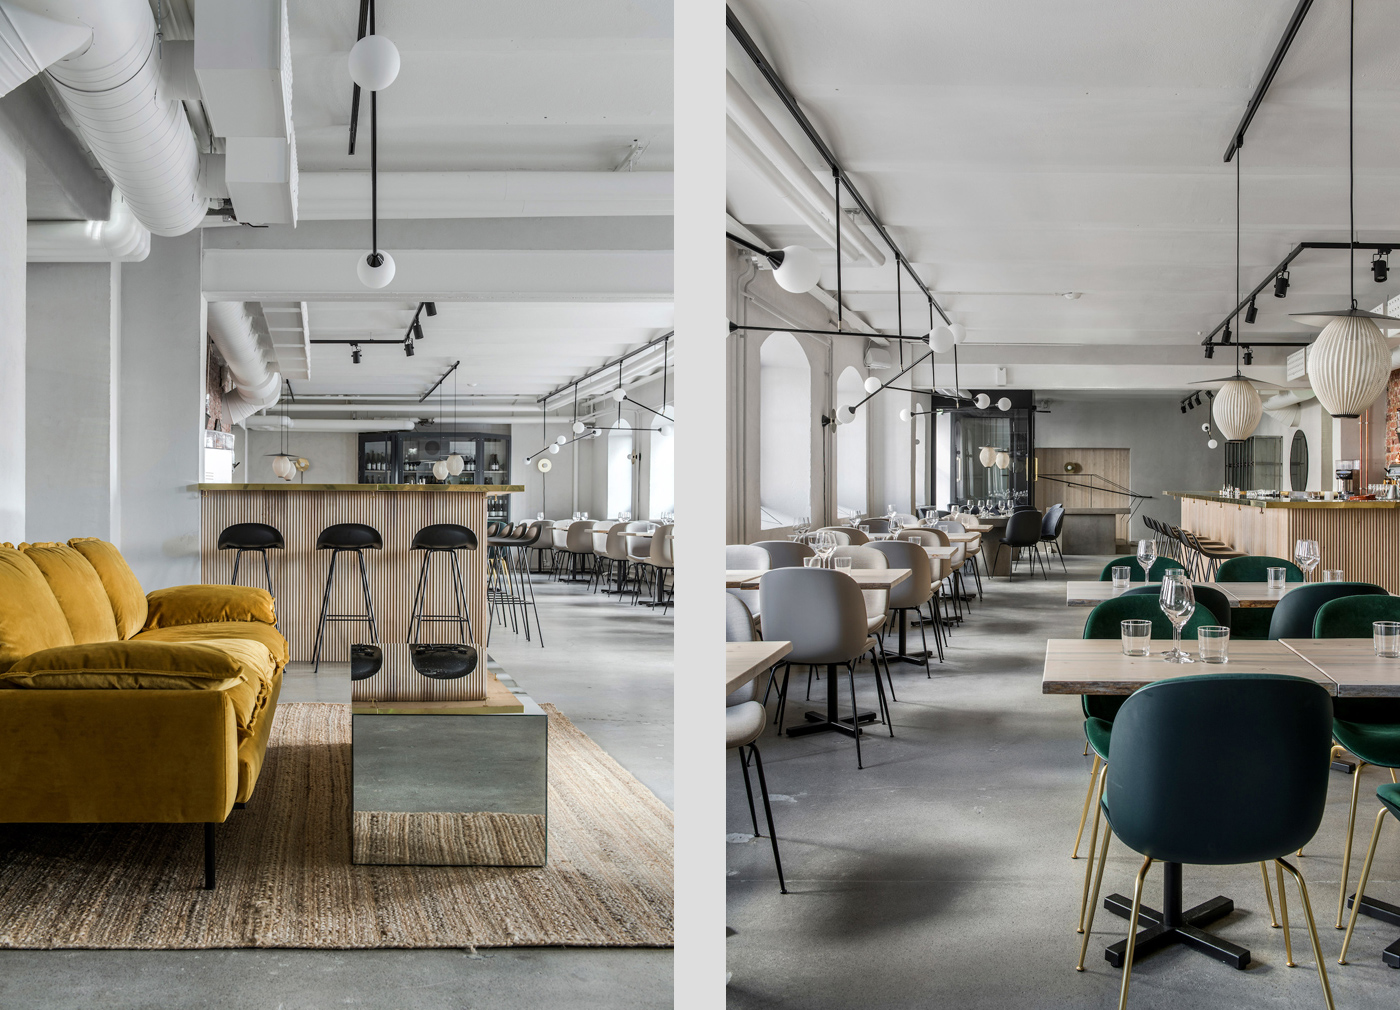 Muted tones set the scene inside Helsinki's Maannos restaurant